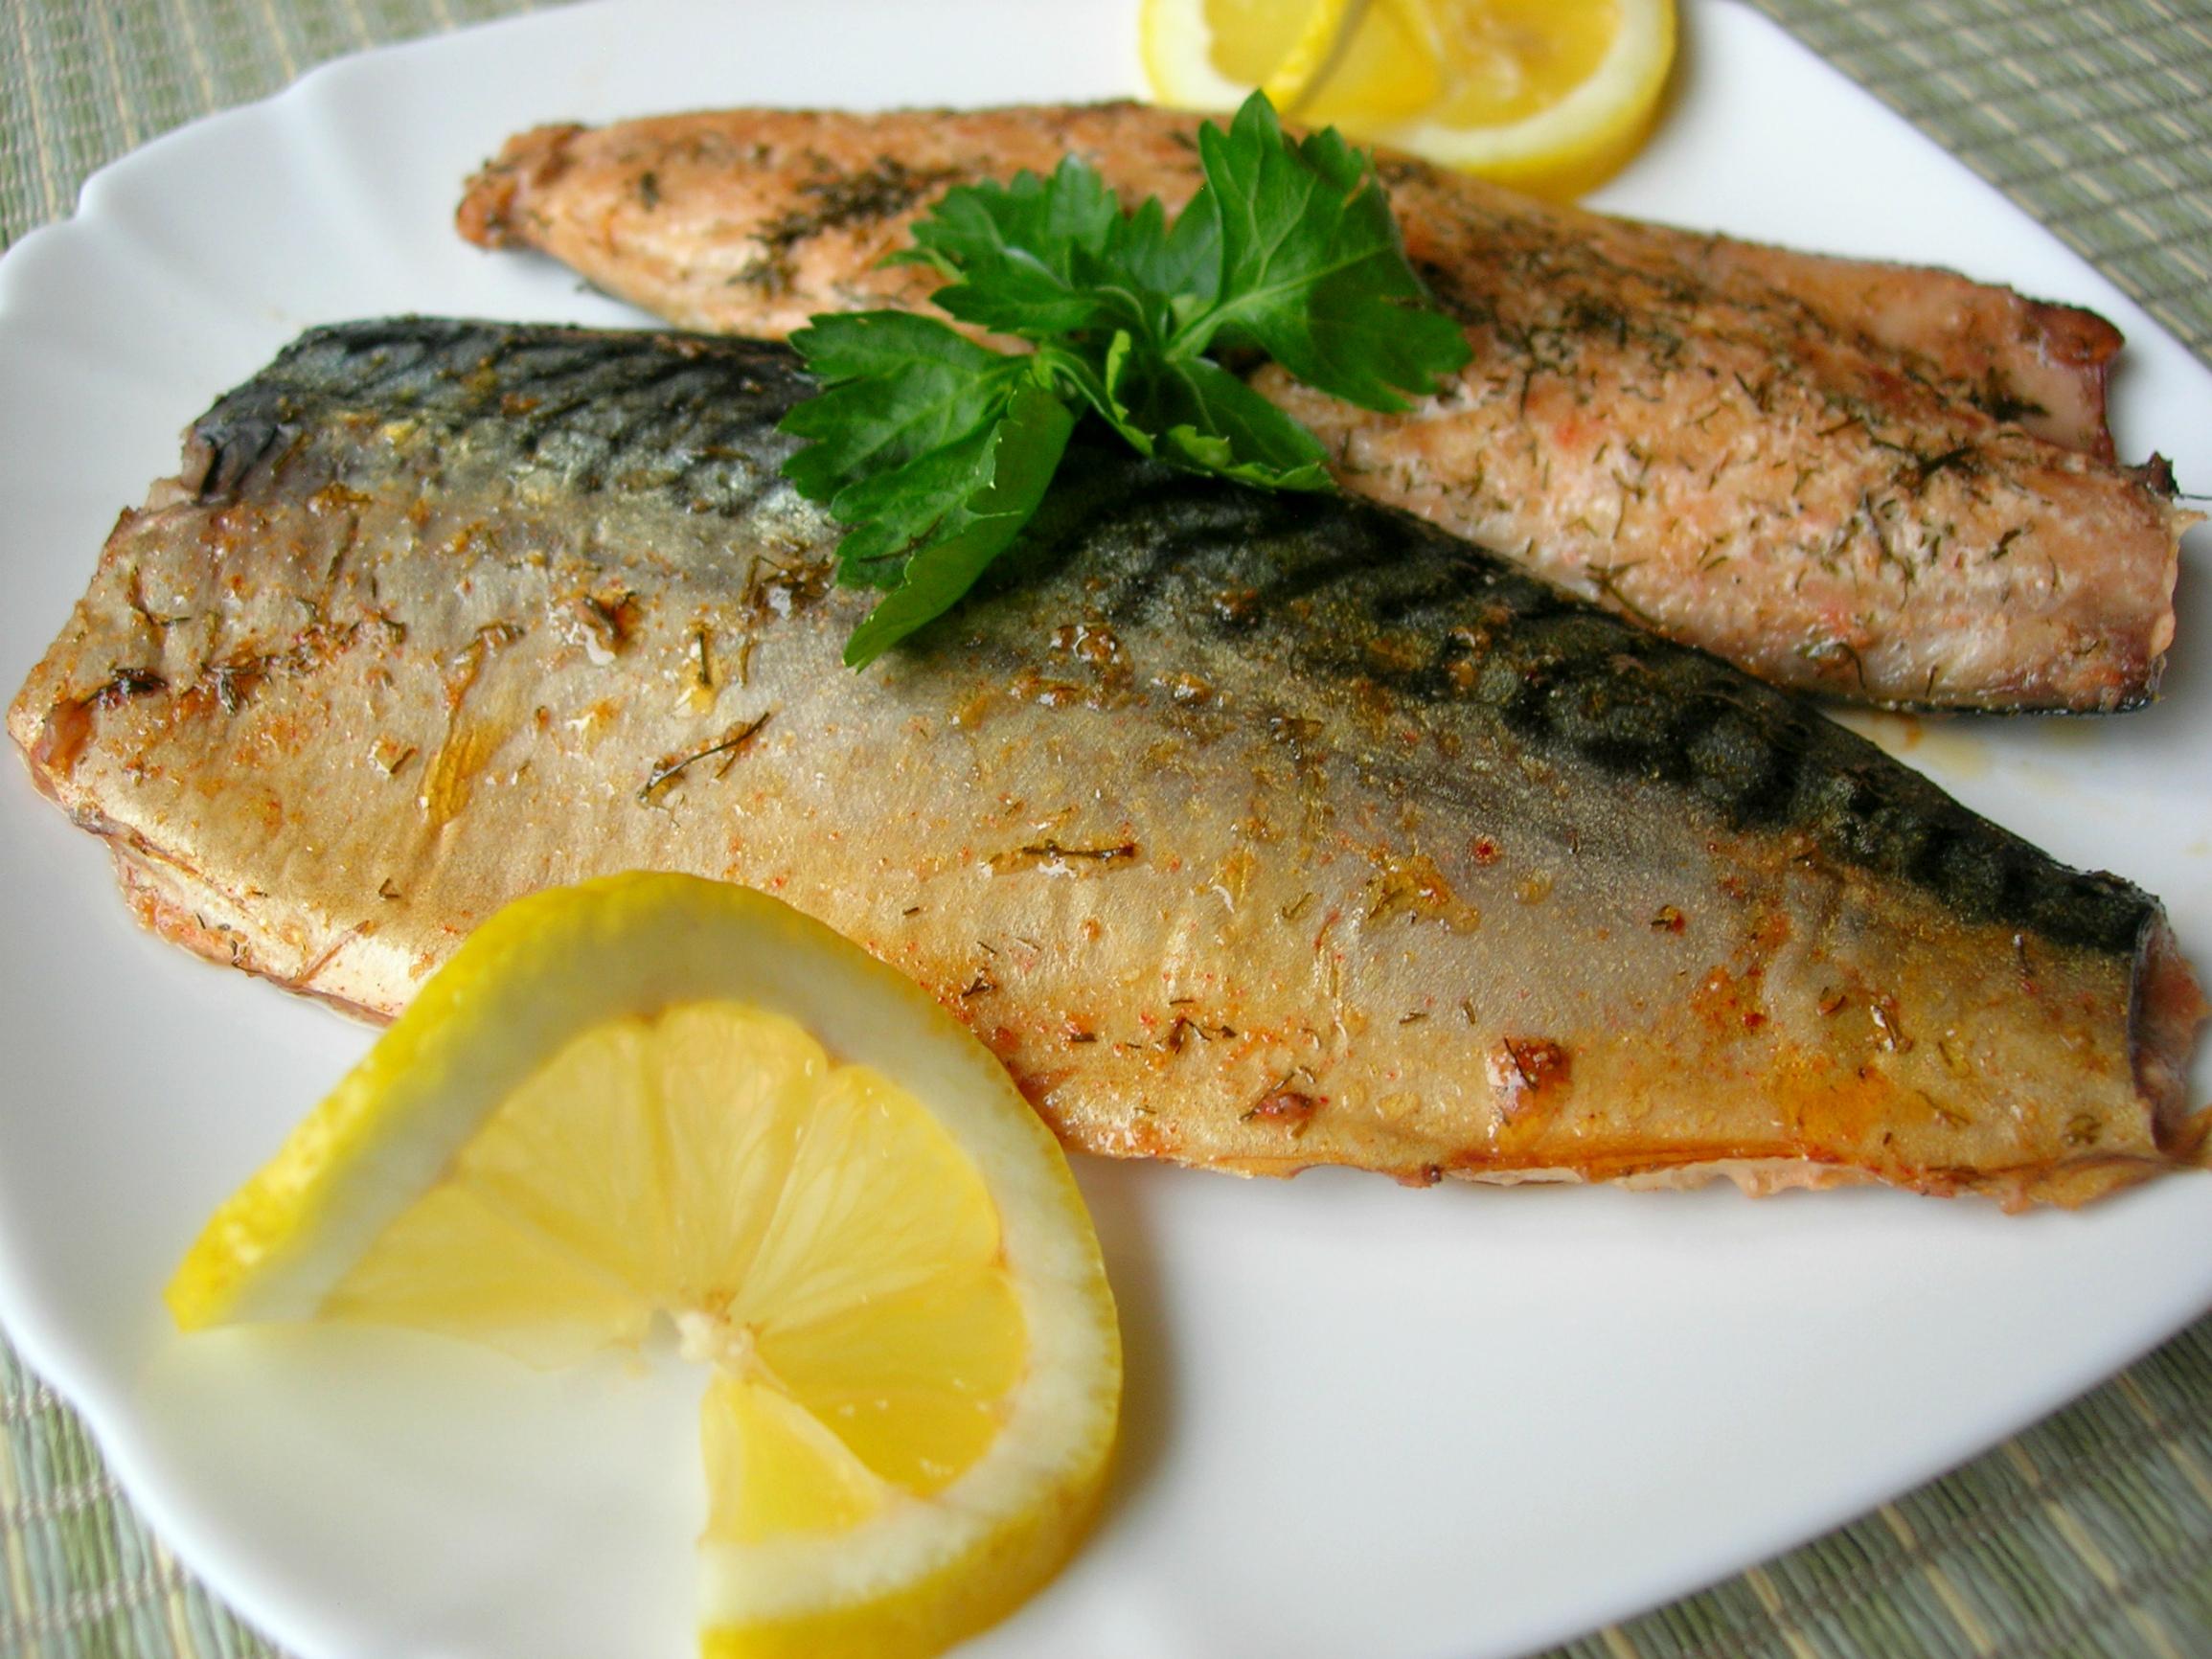 рецепты из рыбы скумбрия с фото сгоняют заключенных